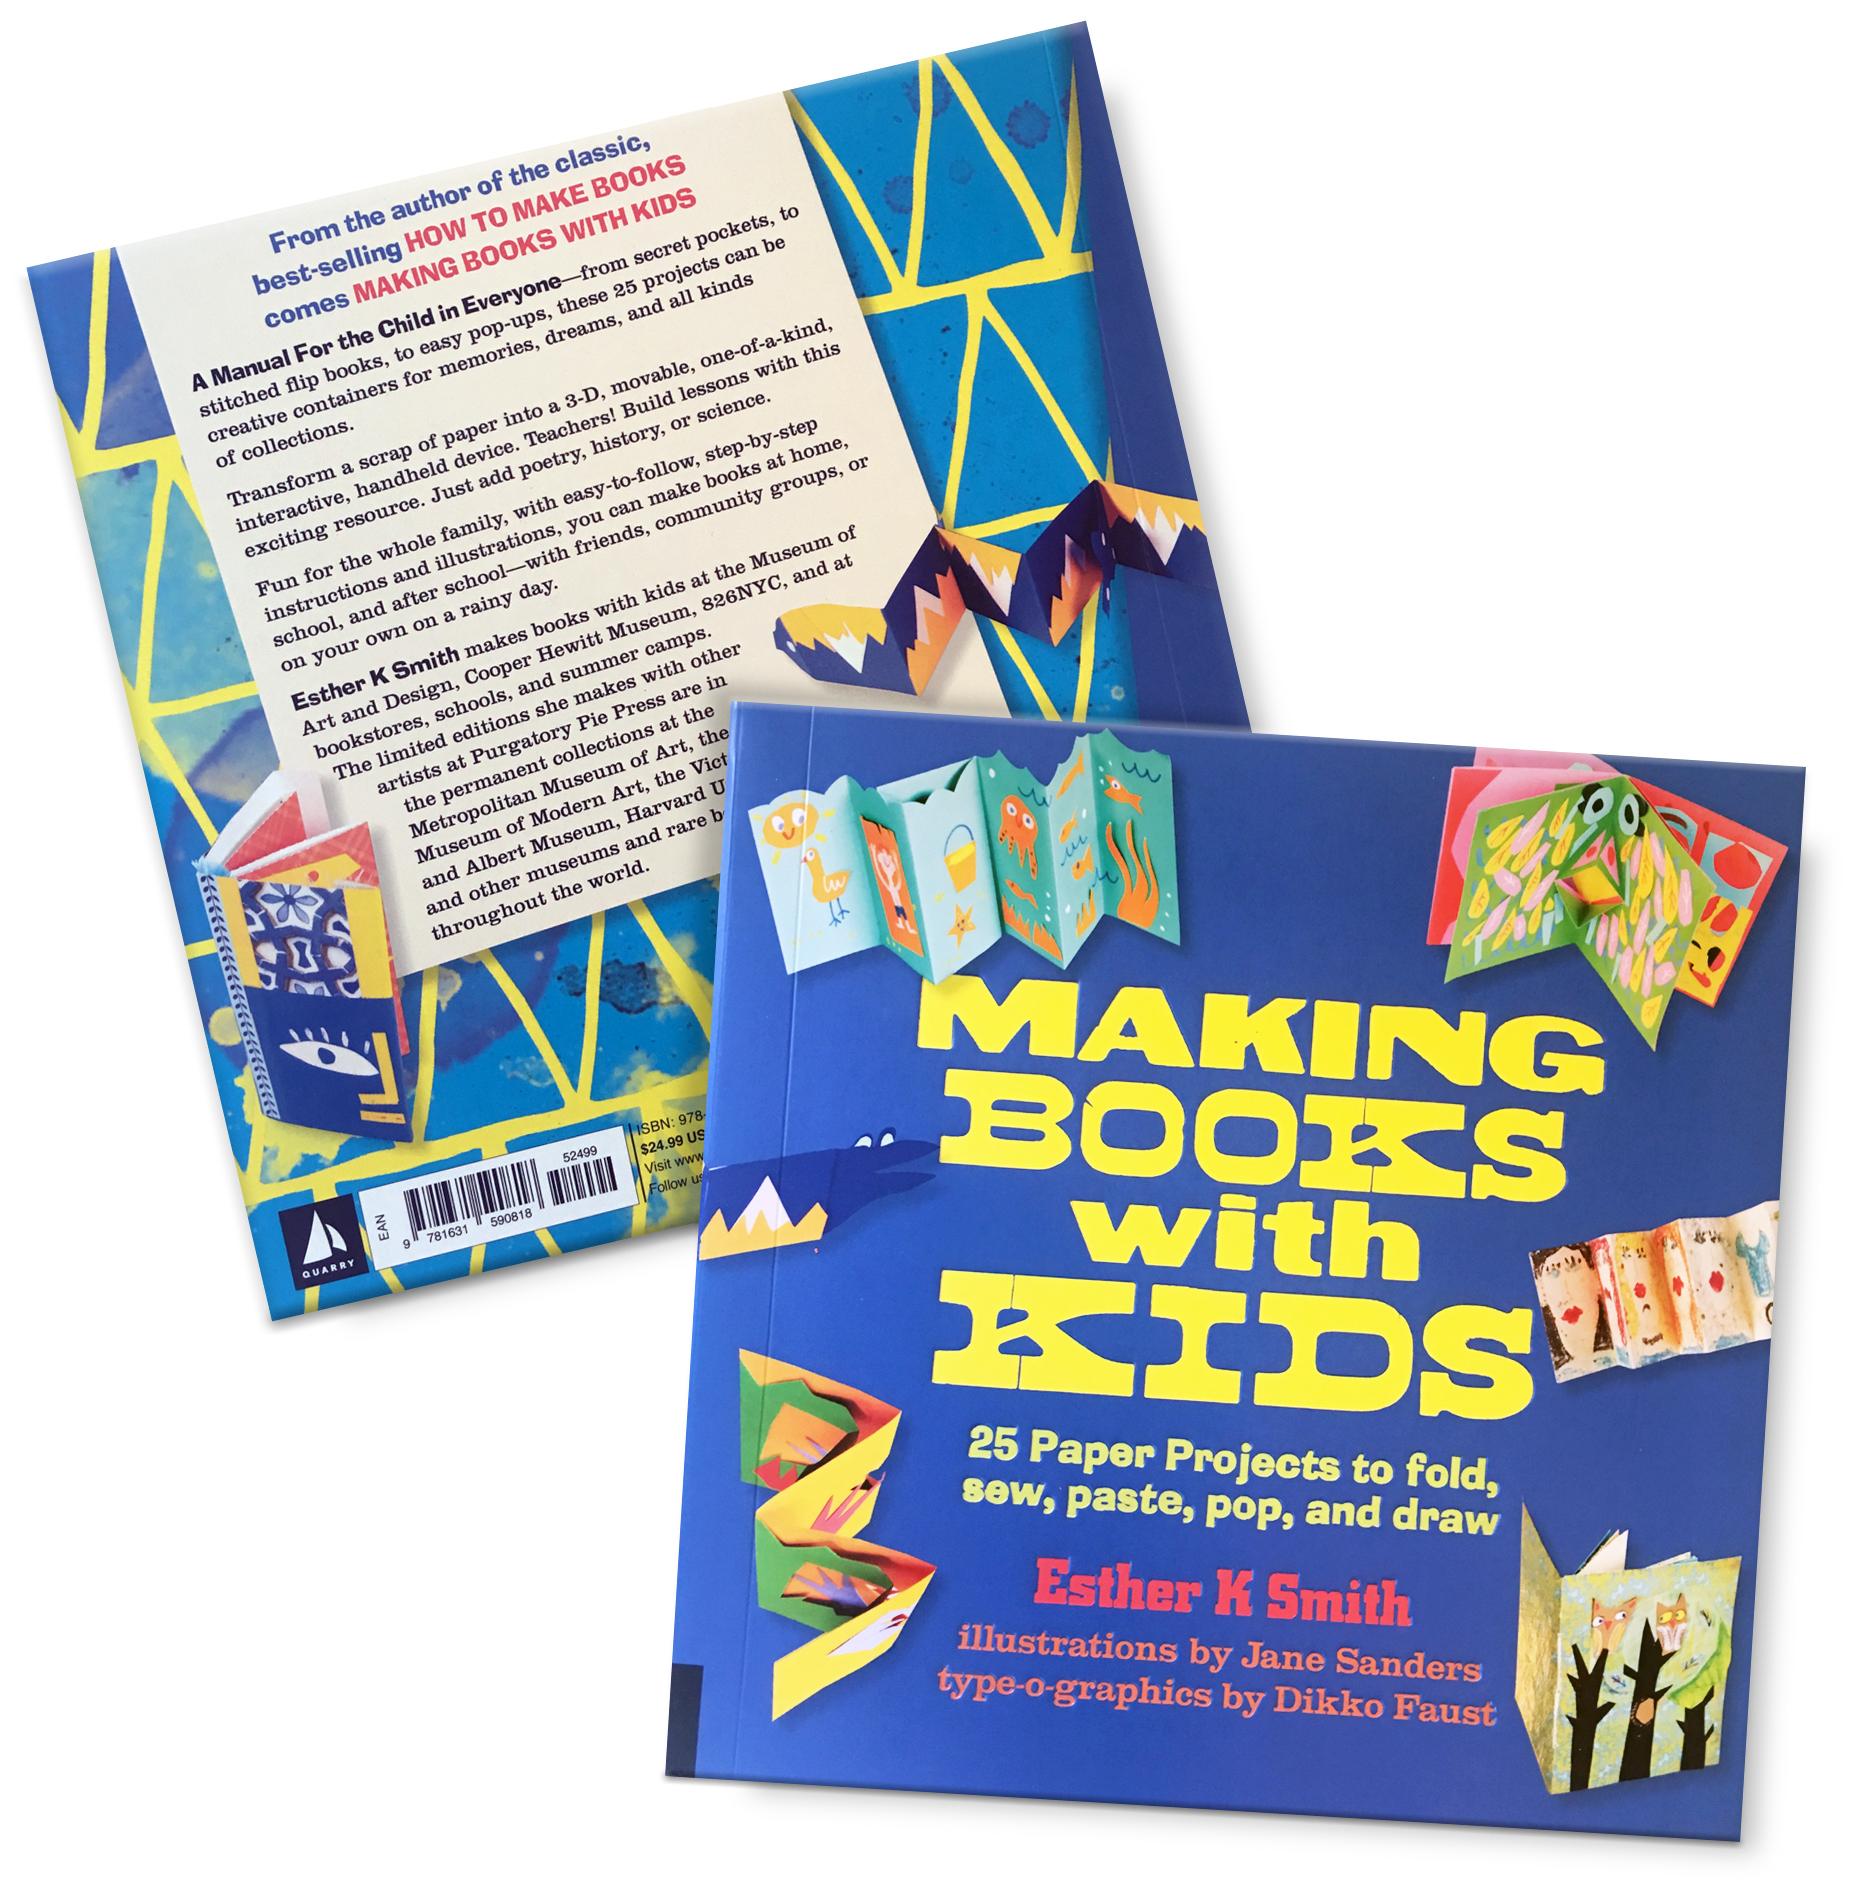 Making Books with Kids, Quarto Books & Purgatory Pie Press